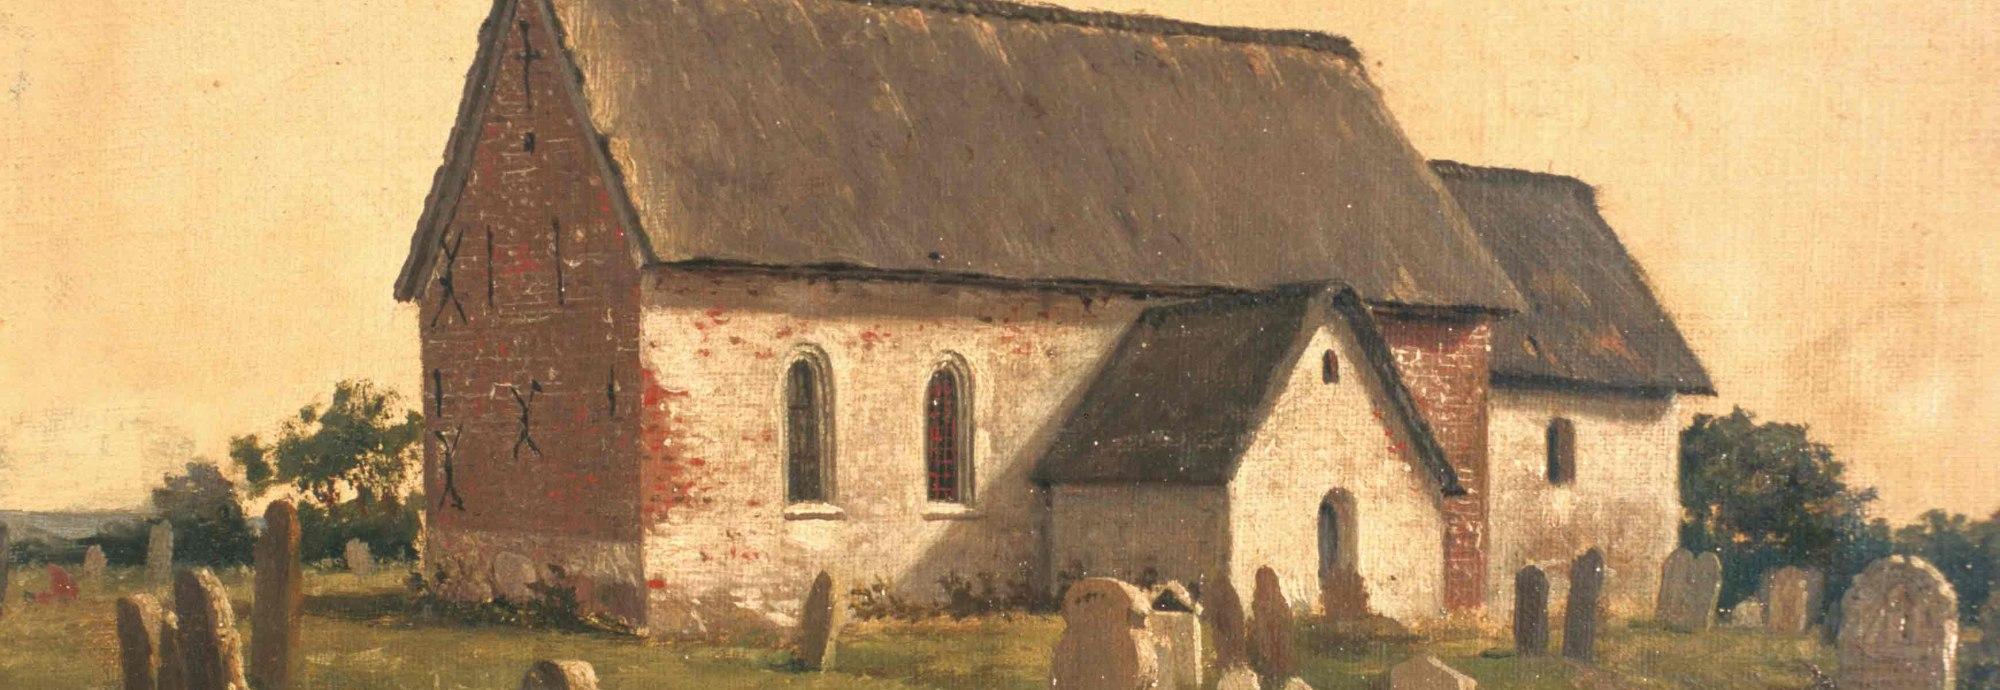 St. Clemens-Kirche Gemälde C. Jessen